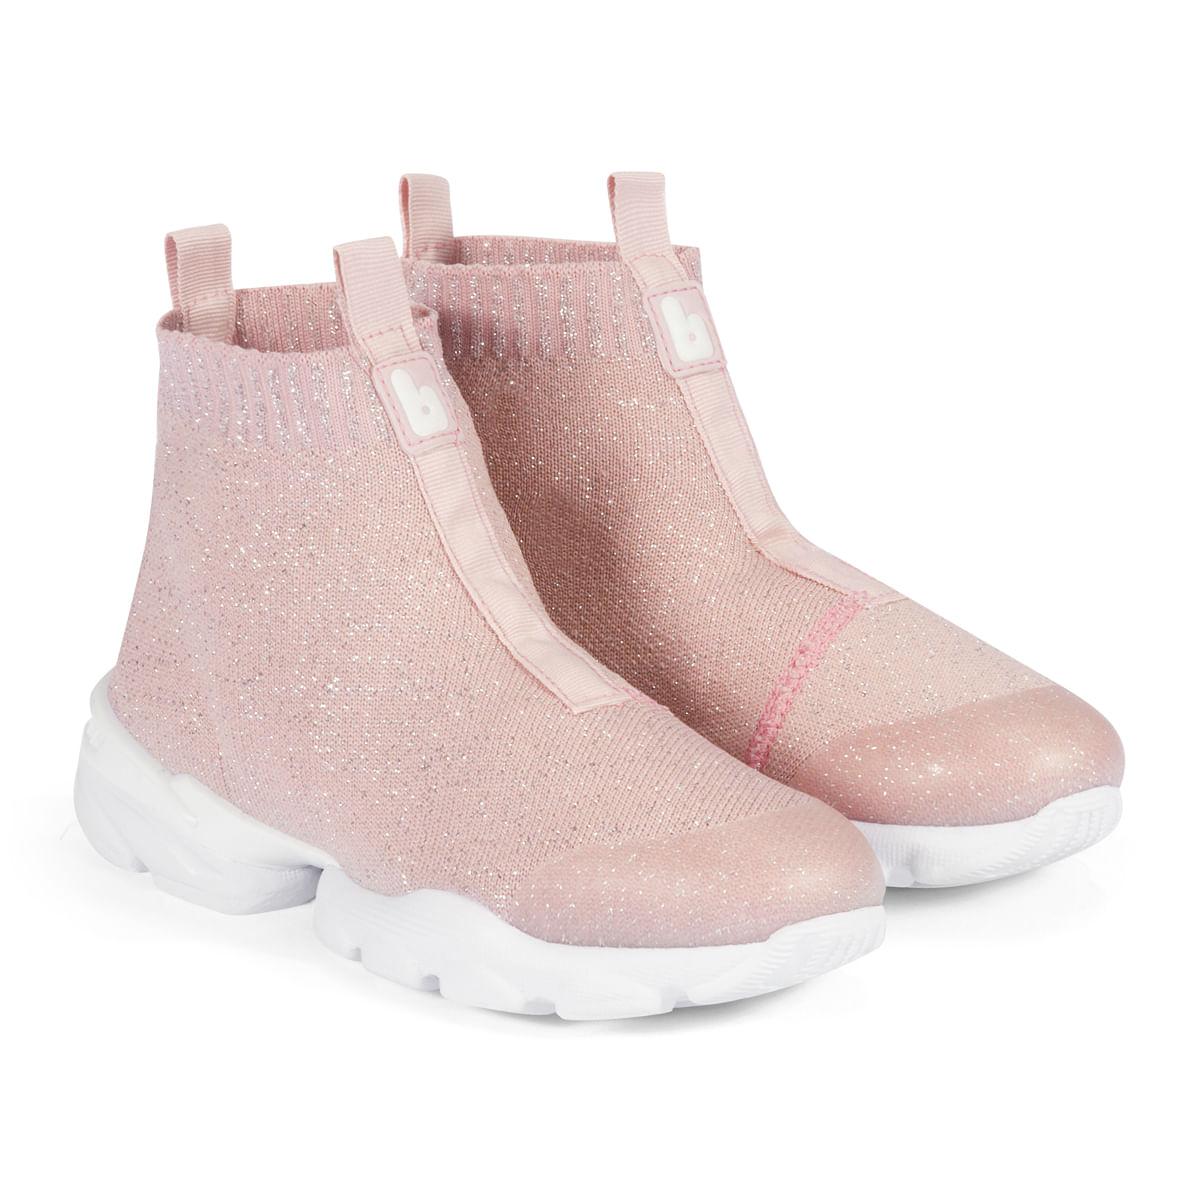 5ad7090d54 Tênis Infantil Bibi Feminino Rosa Drop 983121 - Bibi Calçados